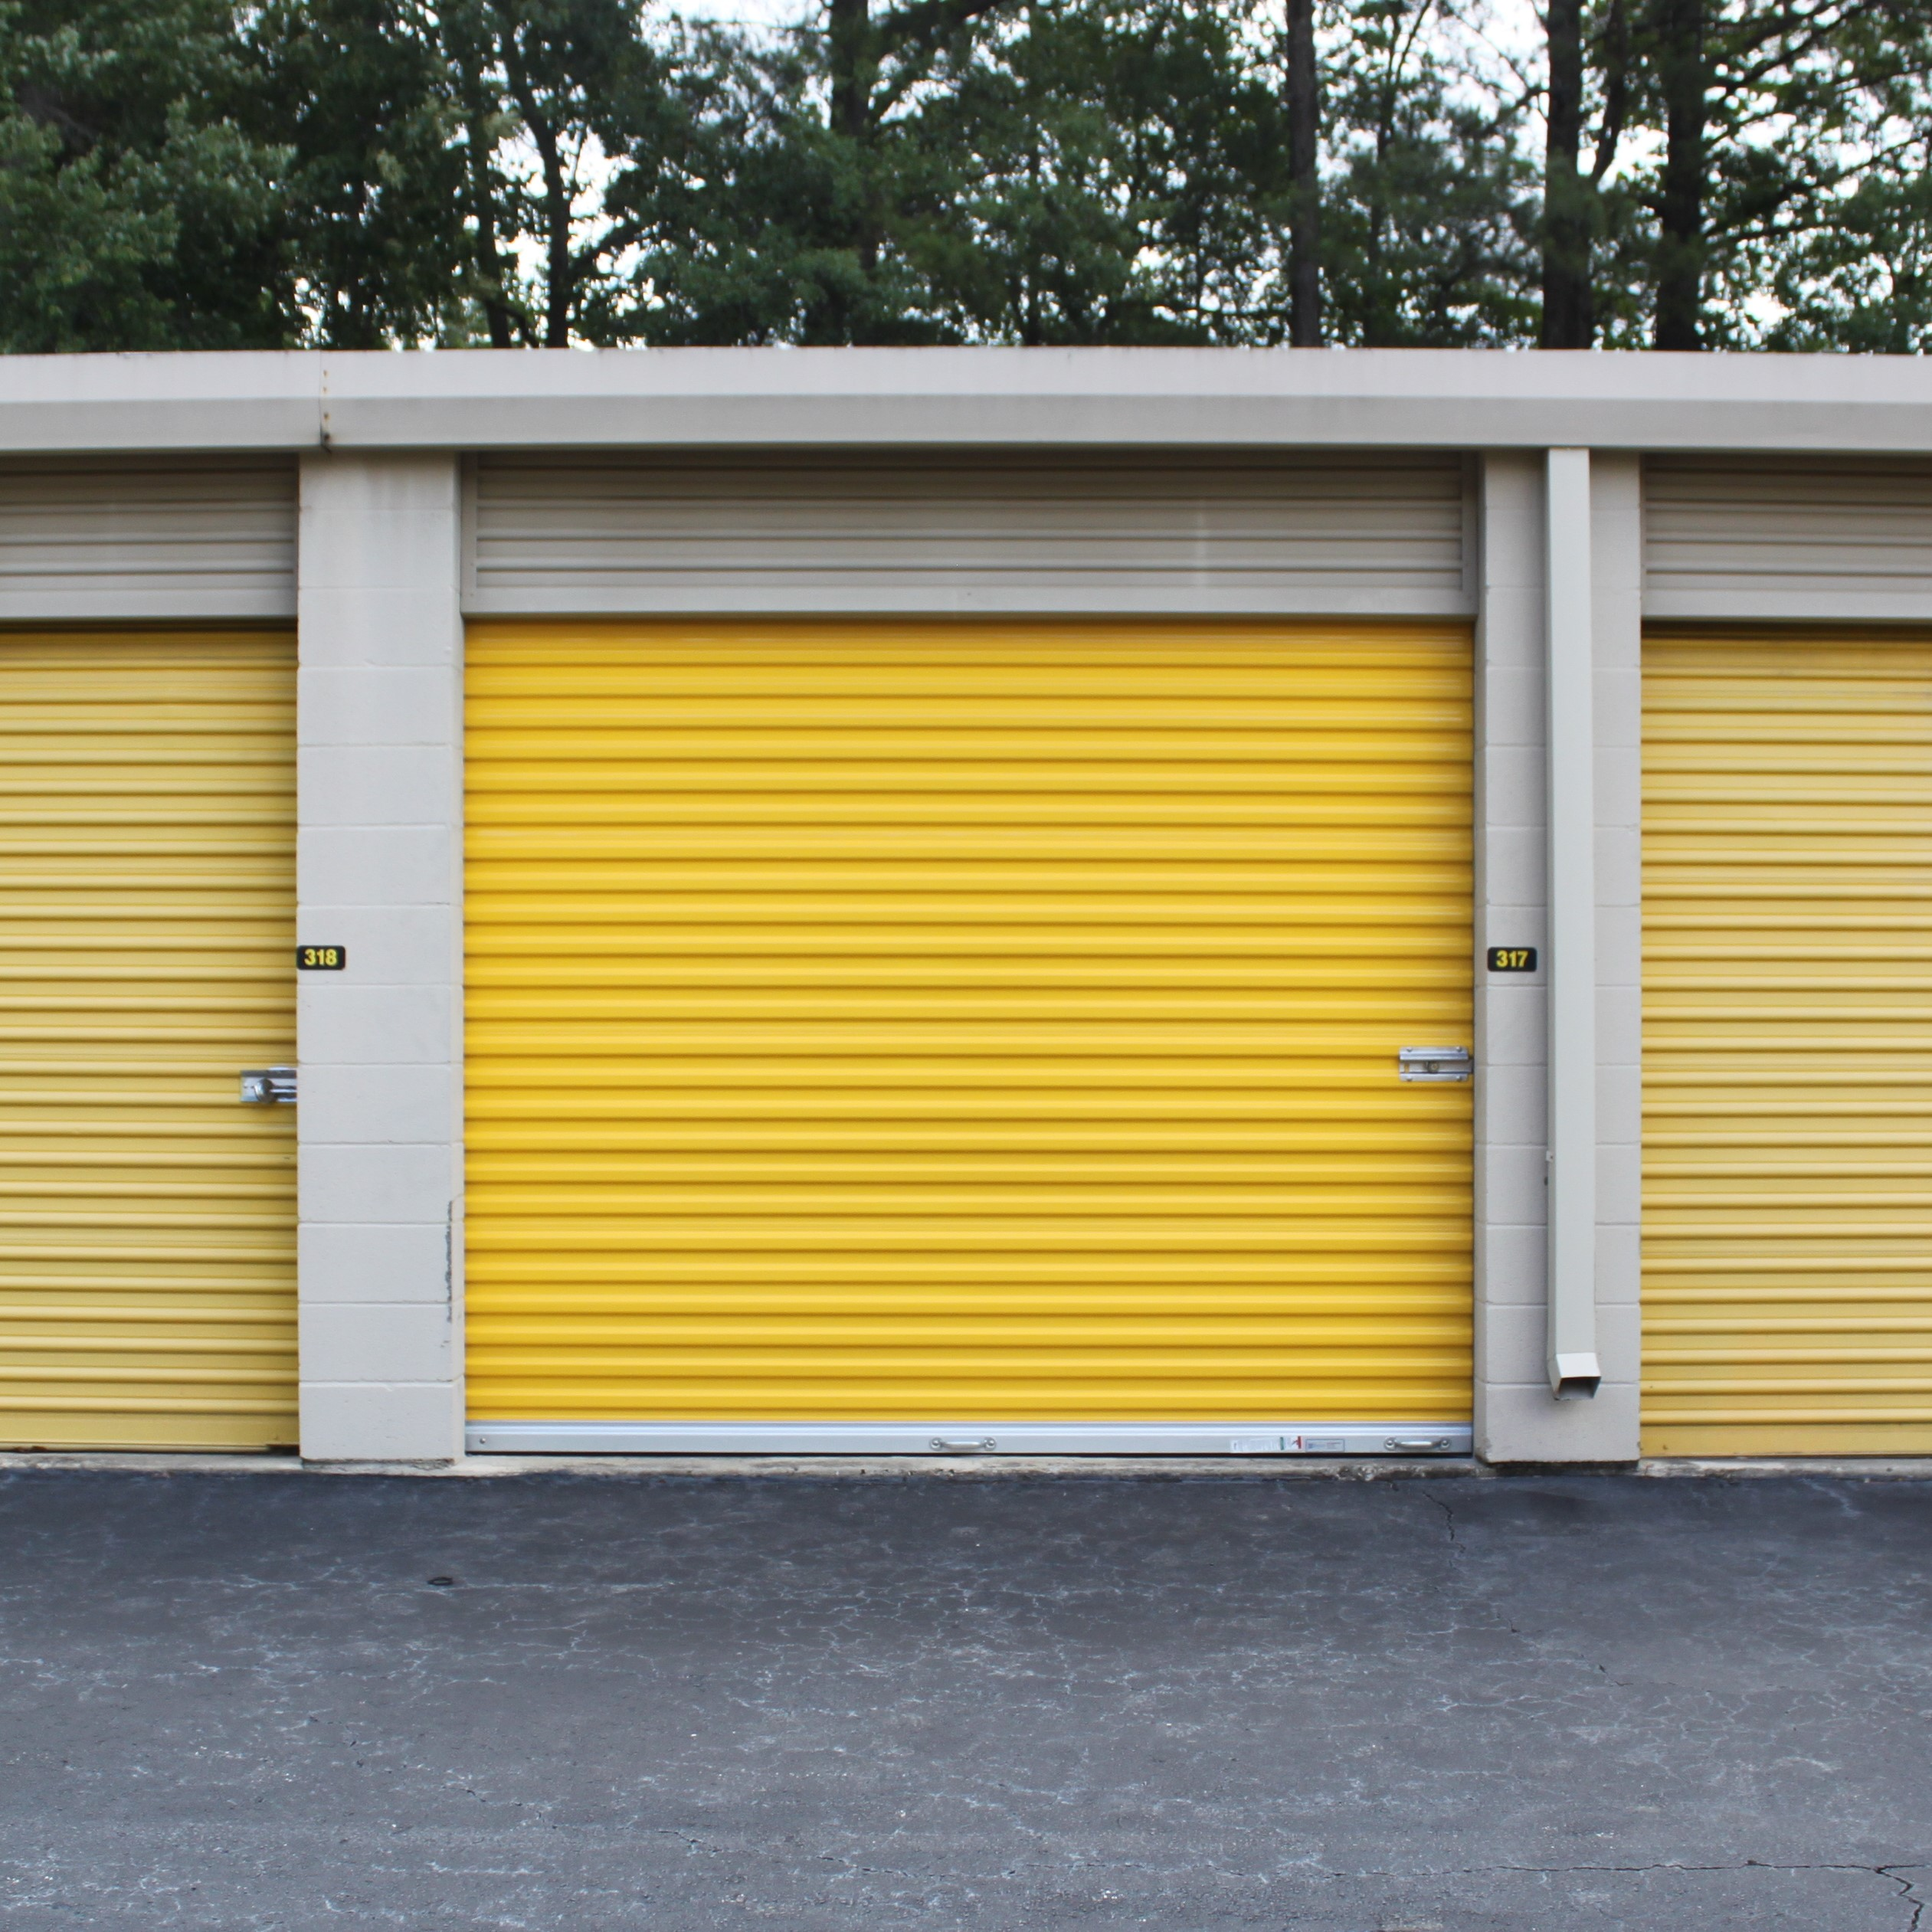 Life Storage_2090 Clay Rd, Austell, GA_5.25.17_DOOR REPLACEMENT (189)-1